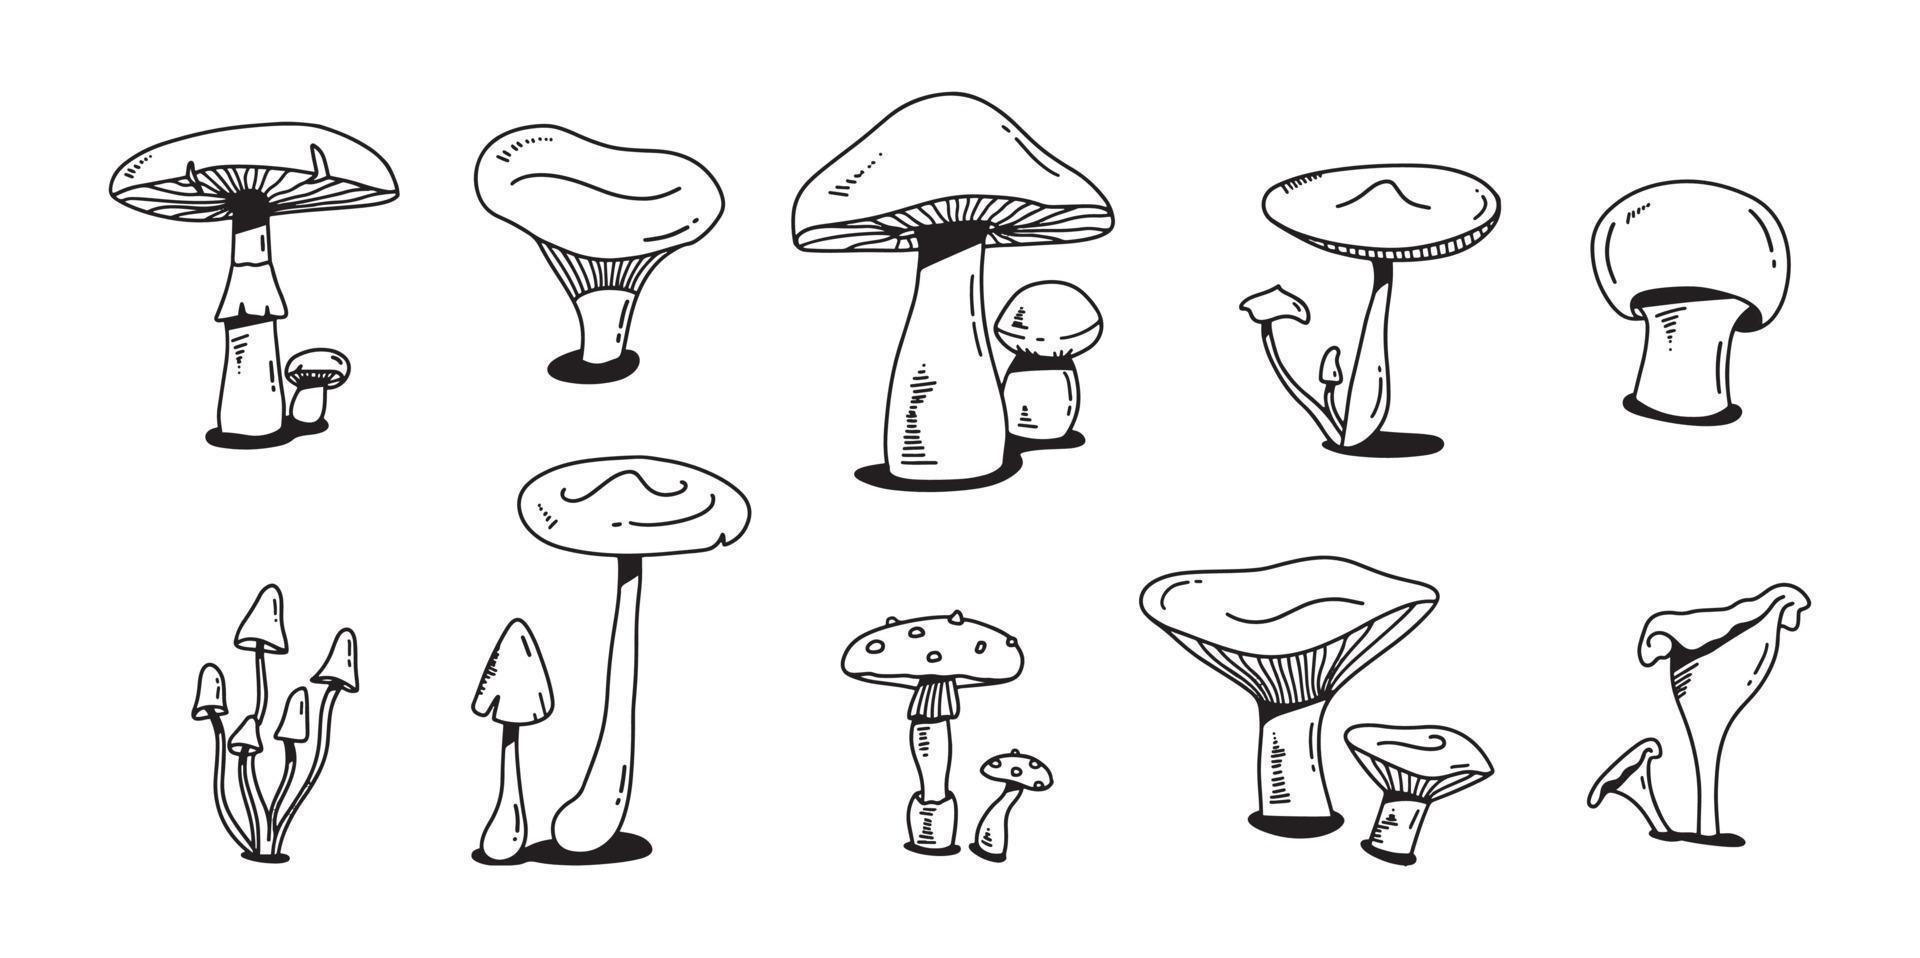 paddestoel kleurrijke doodle set. verschillende paddestoelen hand getekende platte schets. champignon, cantharellen en shiitake. vector